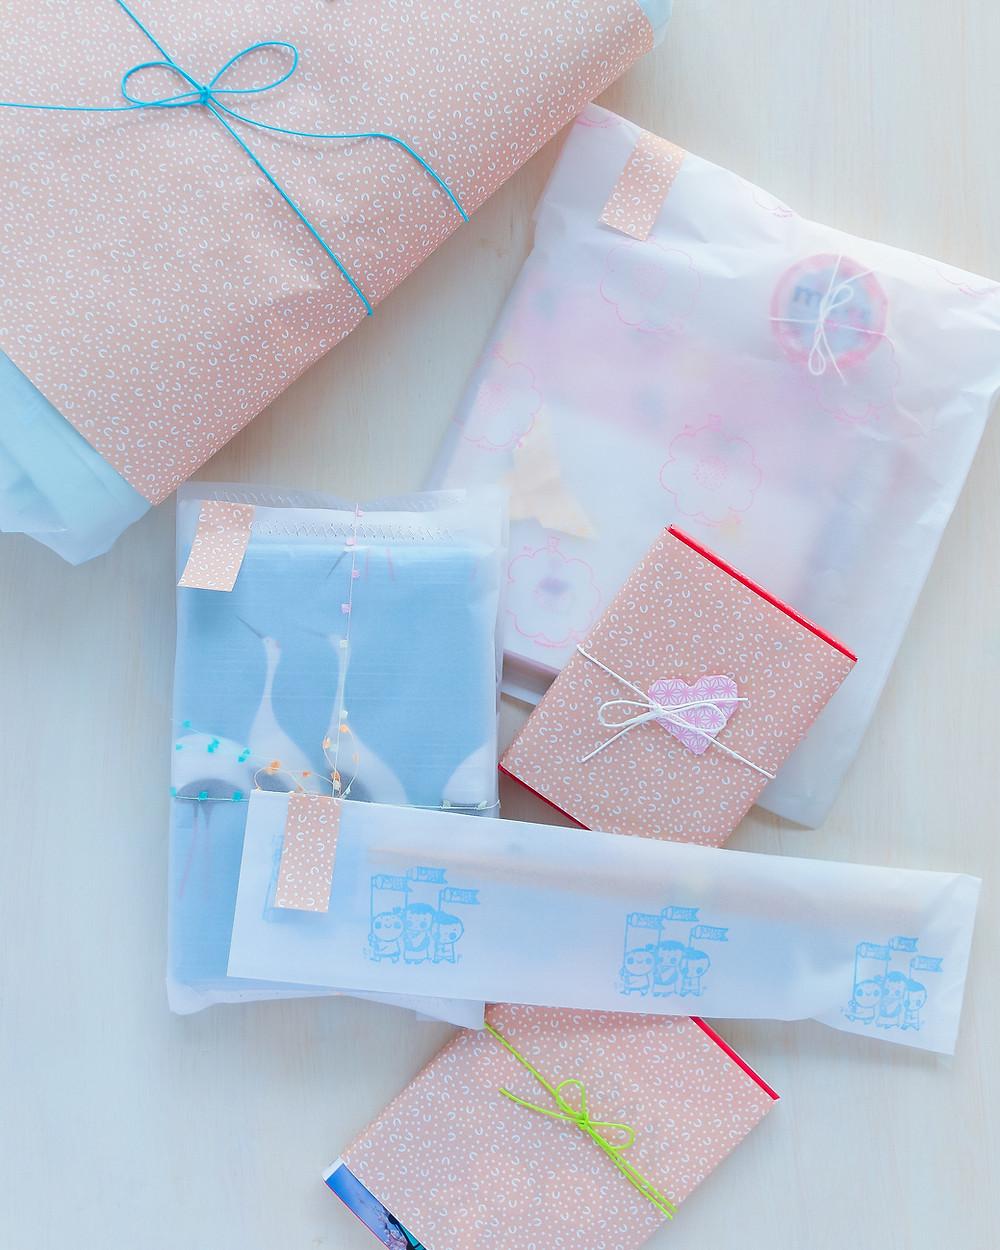 Regalos objetos japoneses wrapping